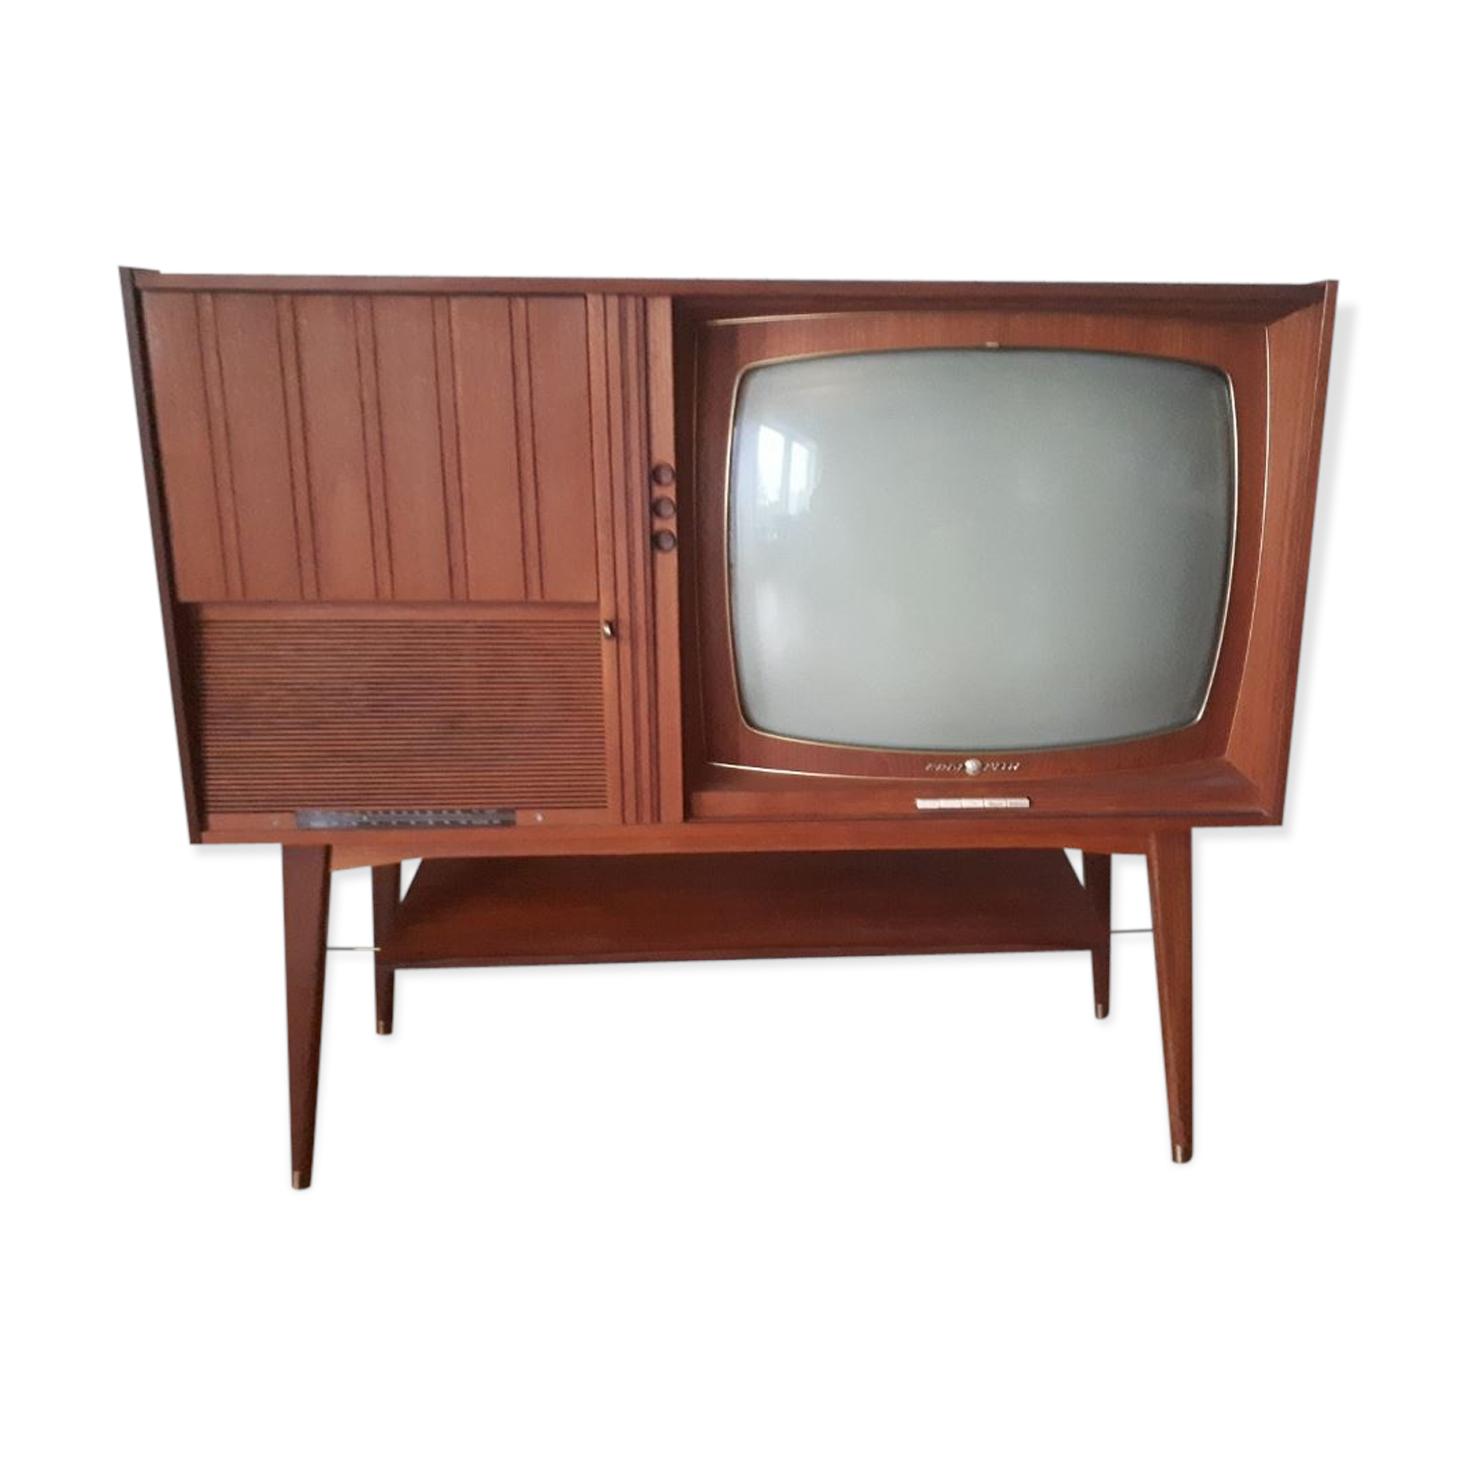 Cabinet T L Vision Hifi Scandinave Vintage Teck Bois  # Etagere Television Plat